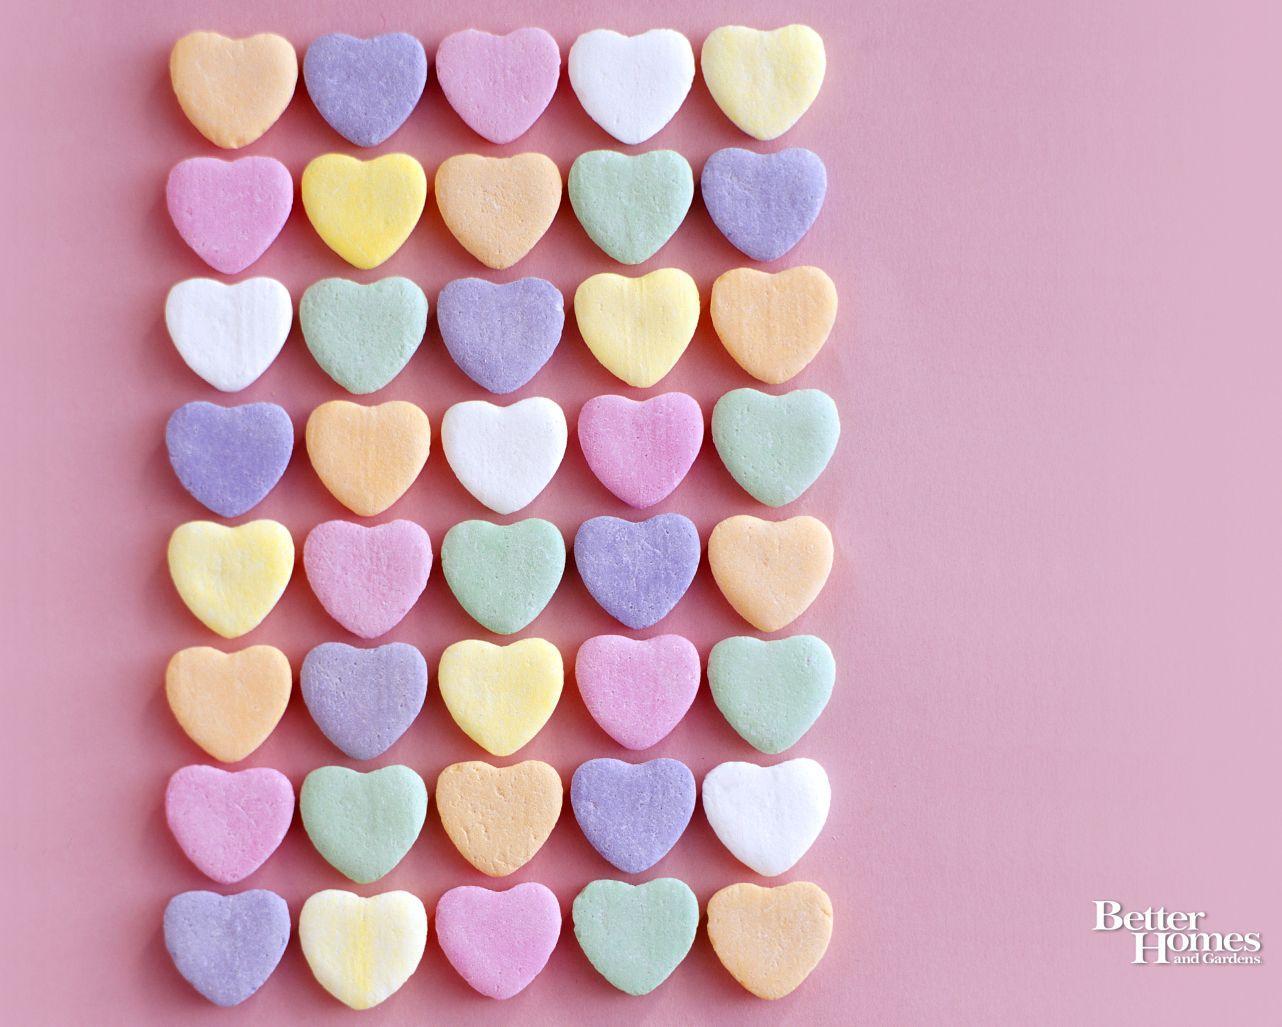 1282x1027 Celebrate Love with 14 Valentine's Day Desktop Wallpaper - Brand